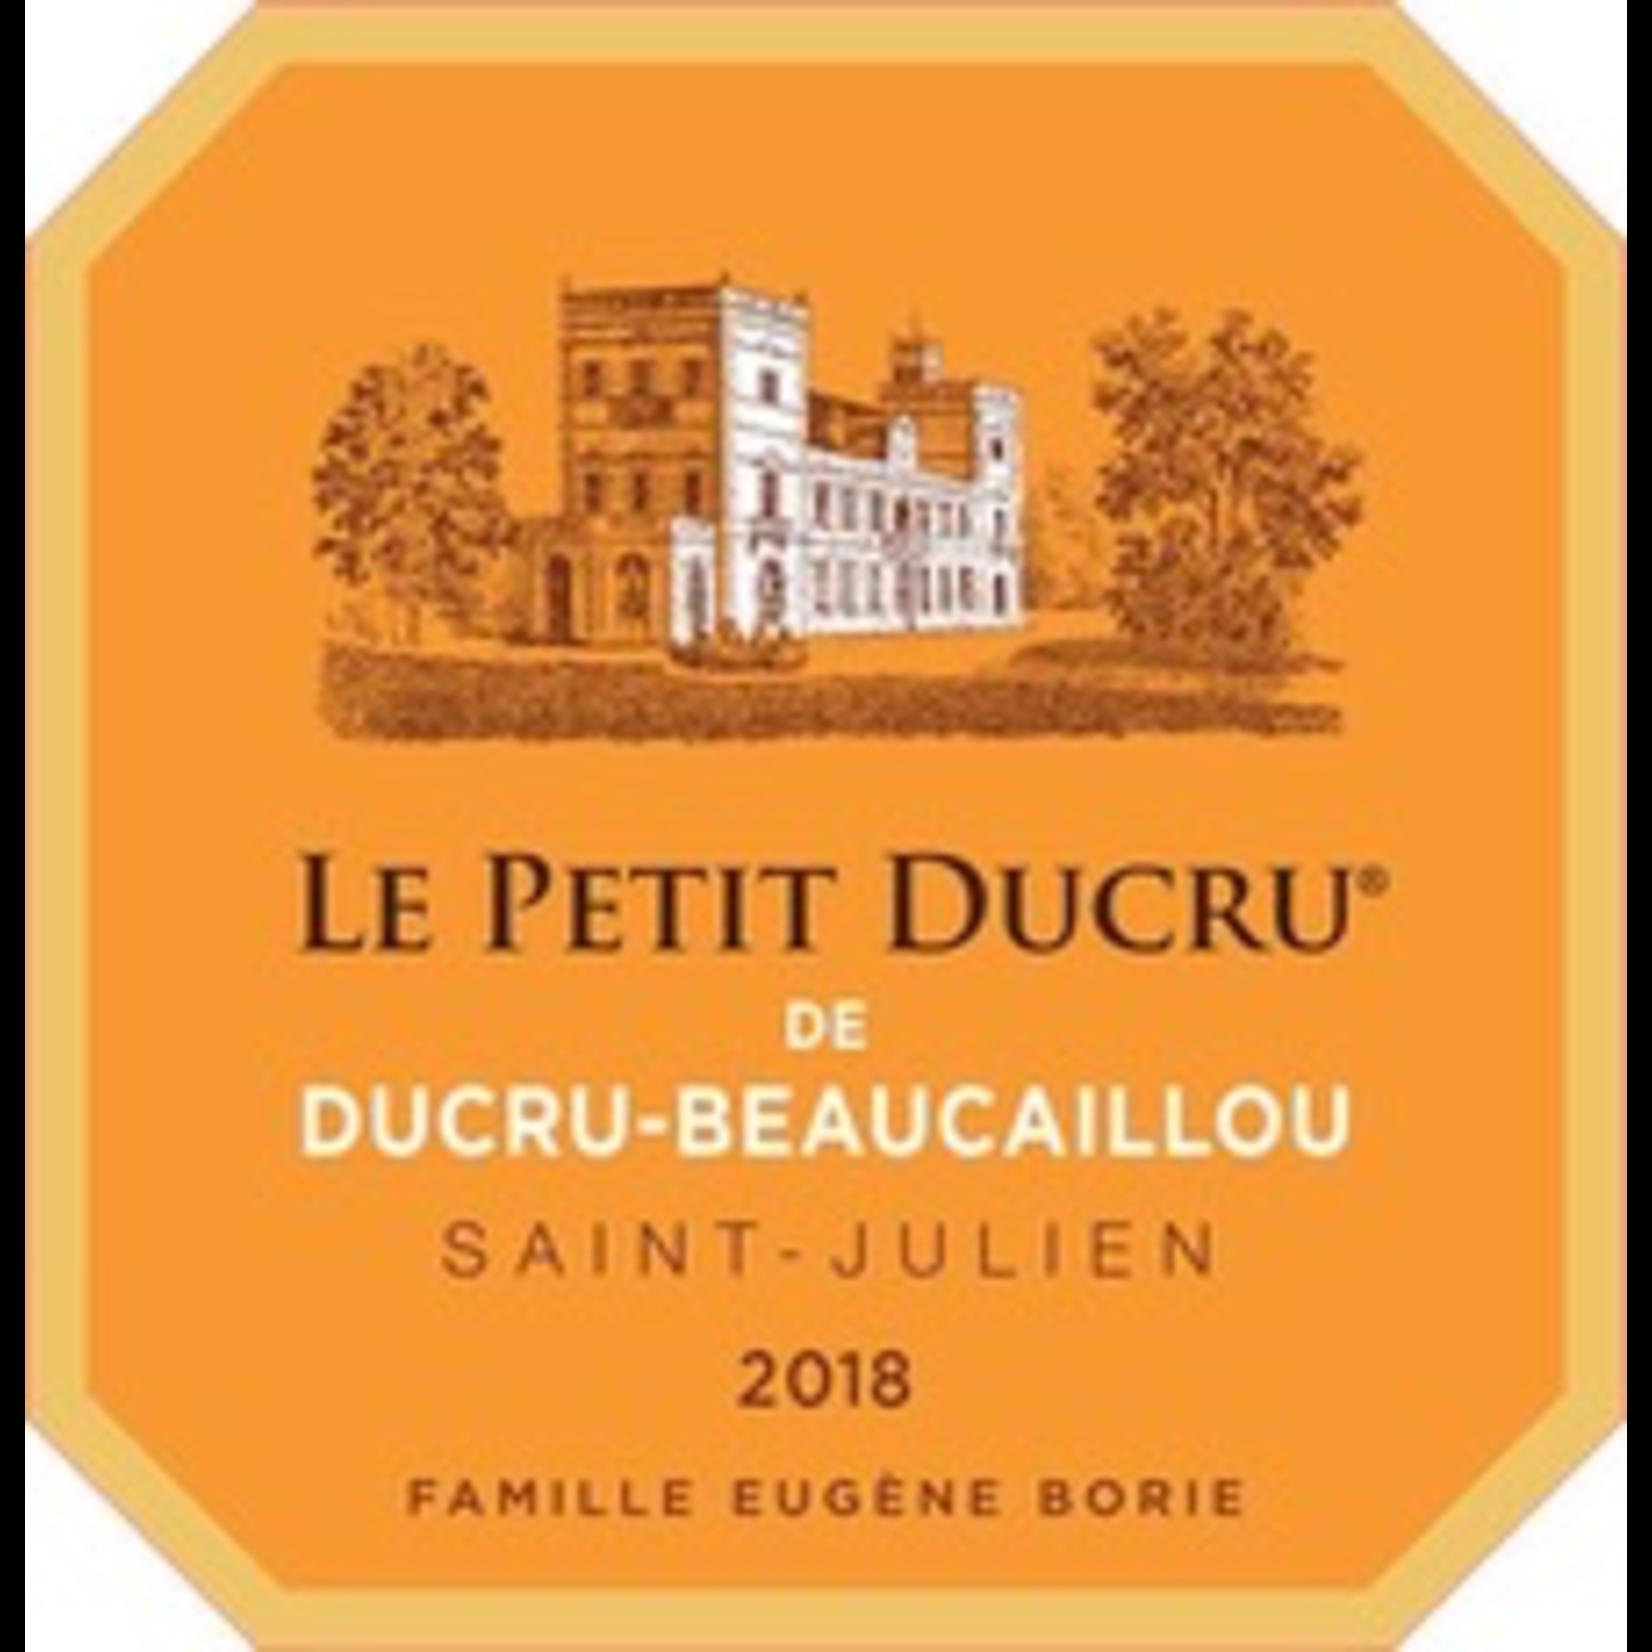 Wine Chateau Petit Ducru Beaucaillou 2018 375ml